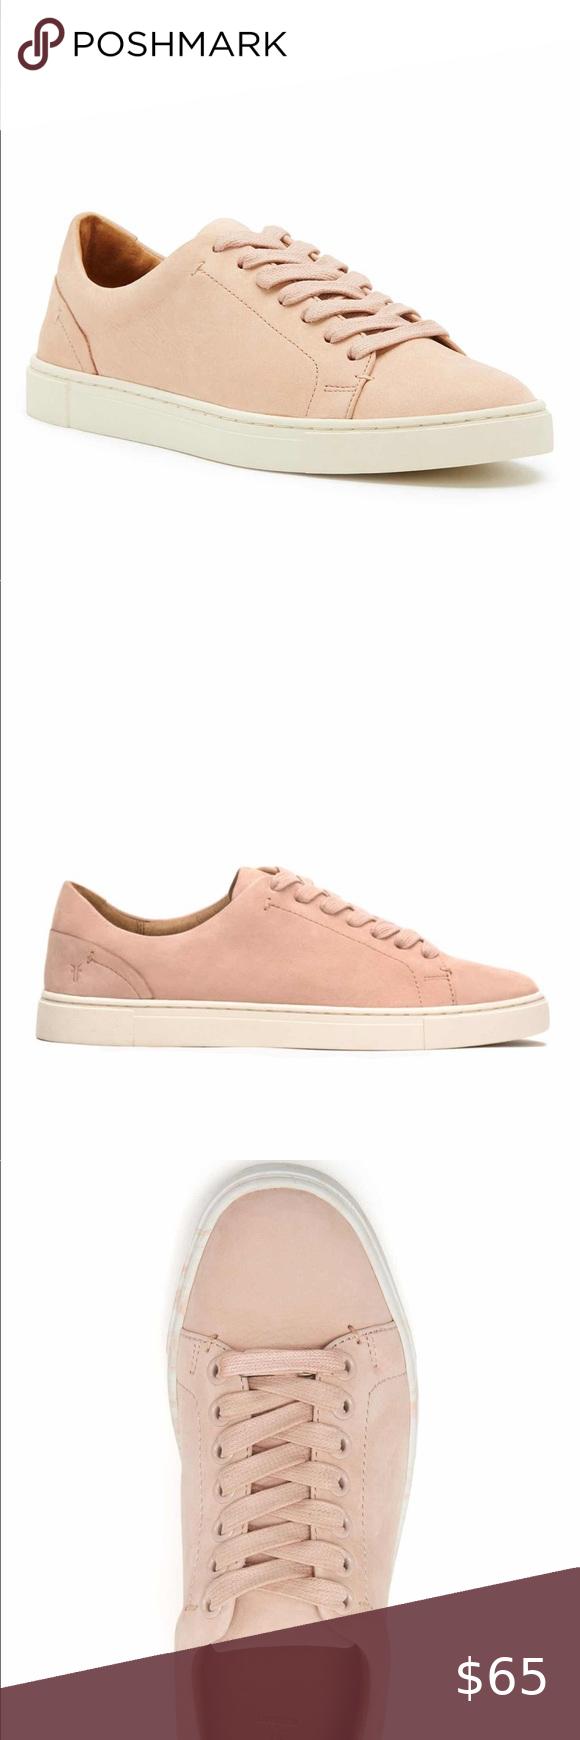 Frye ivy low top leather sneaker in